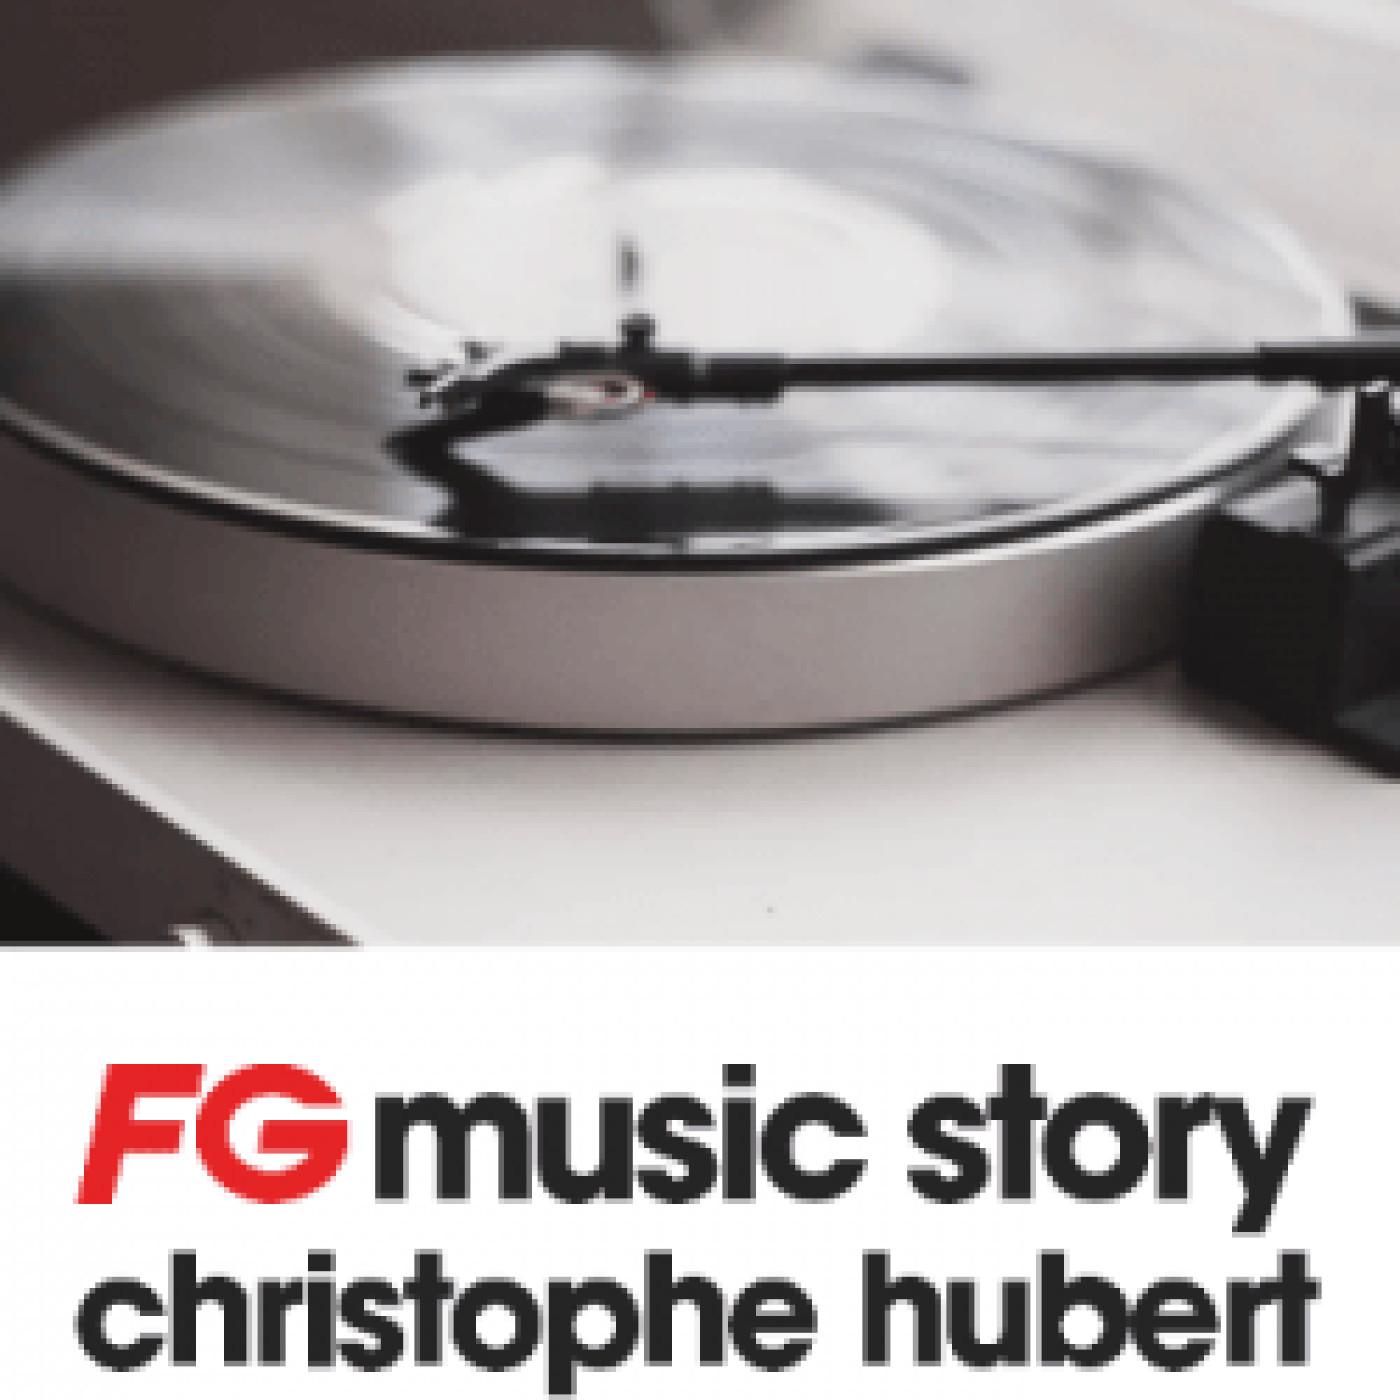 FG MUSIC STORY : CECILIA KRULL